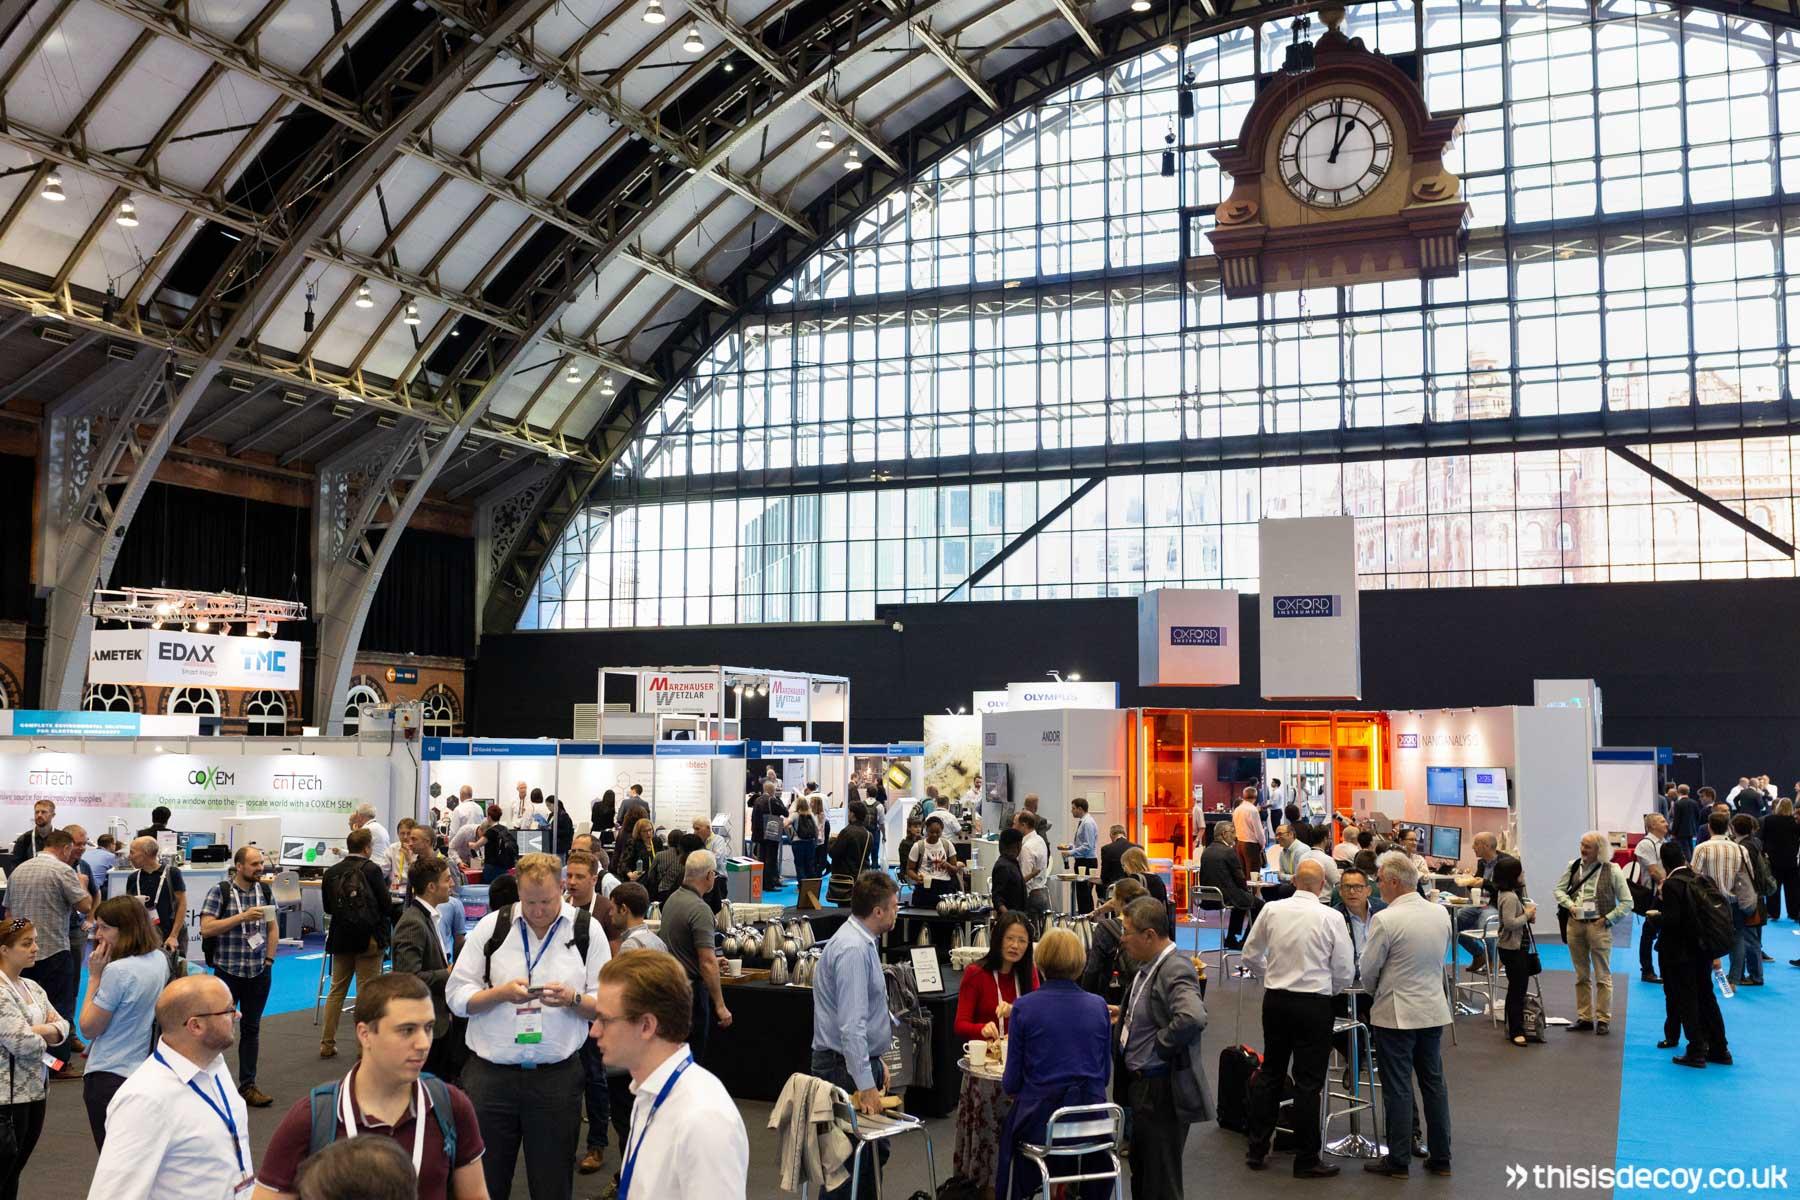 busy exhibiton hall